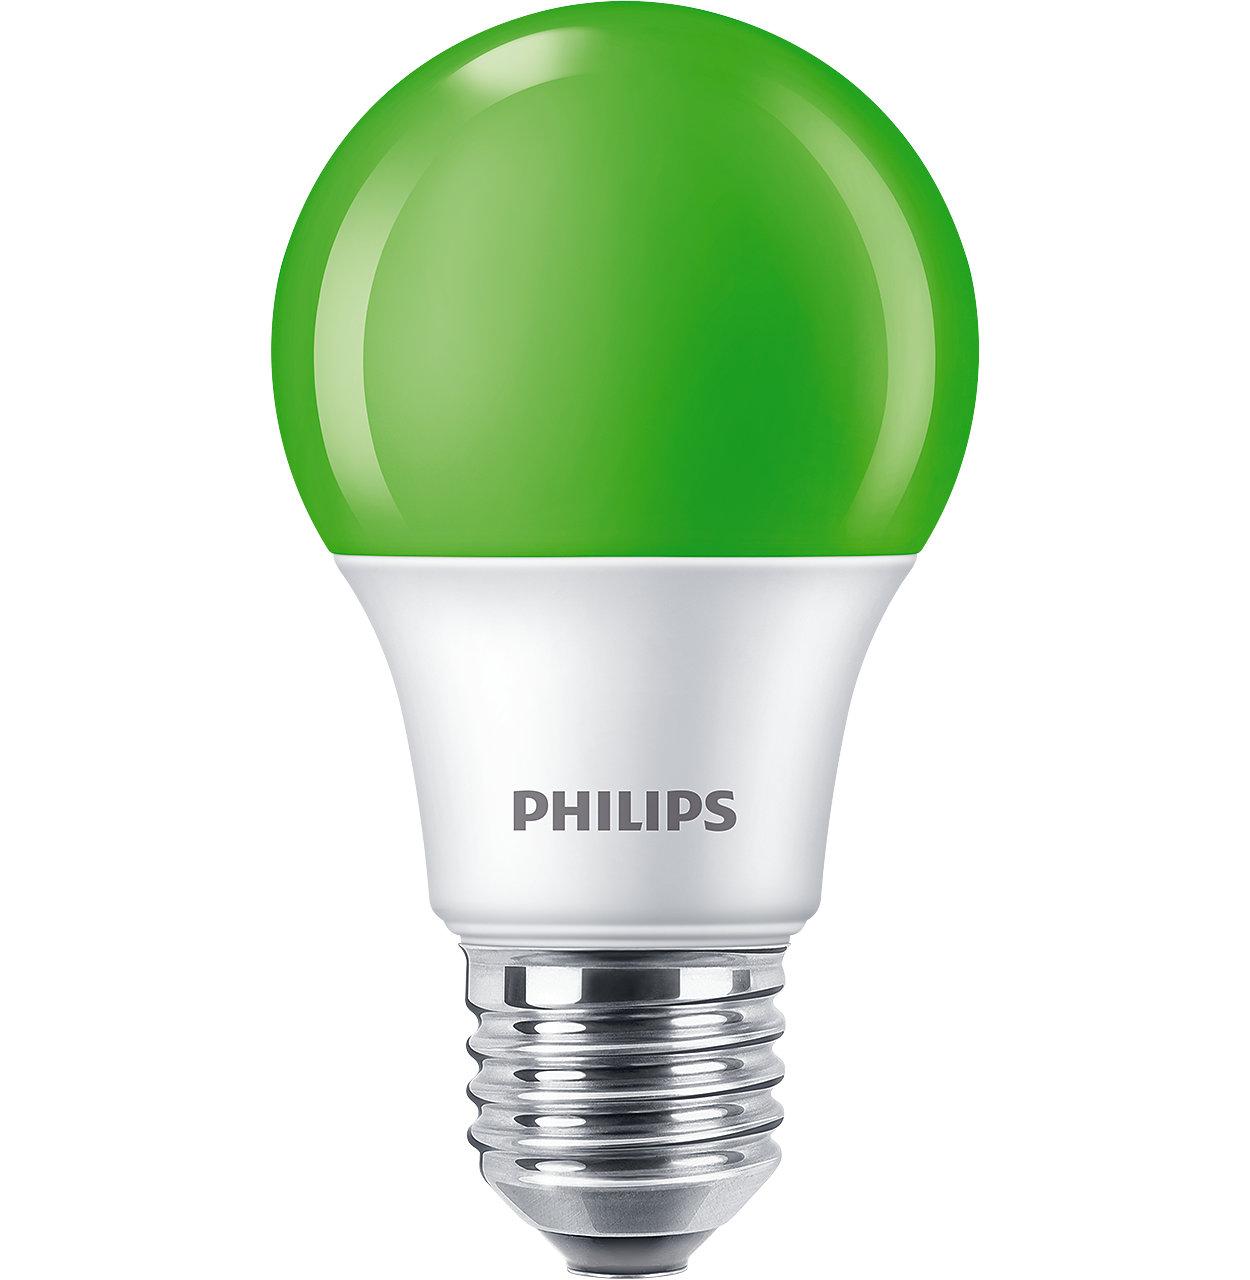 Alternativa LED atractiva y regulable para las luces incandescentes populares.